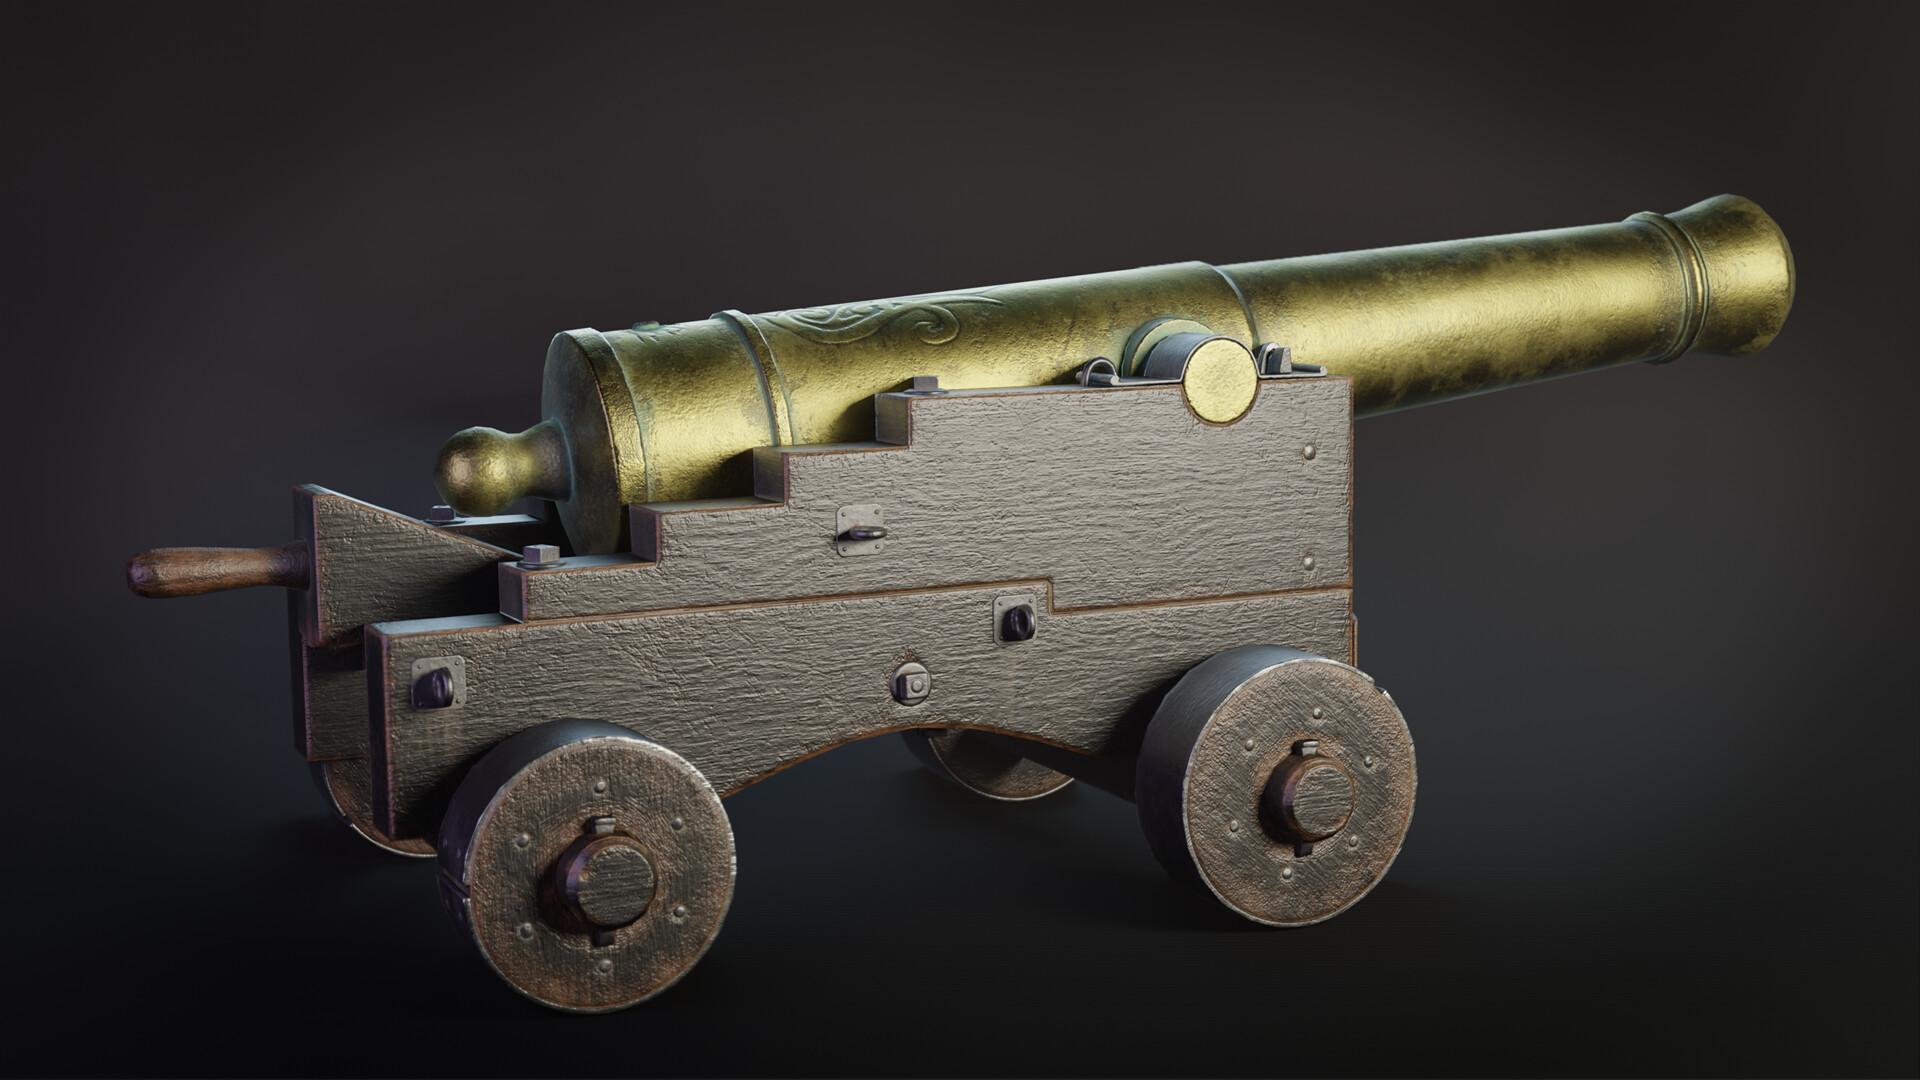 Pavel mazanik naval cannon render 01